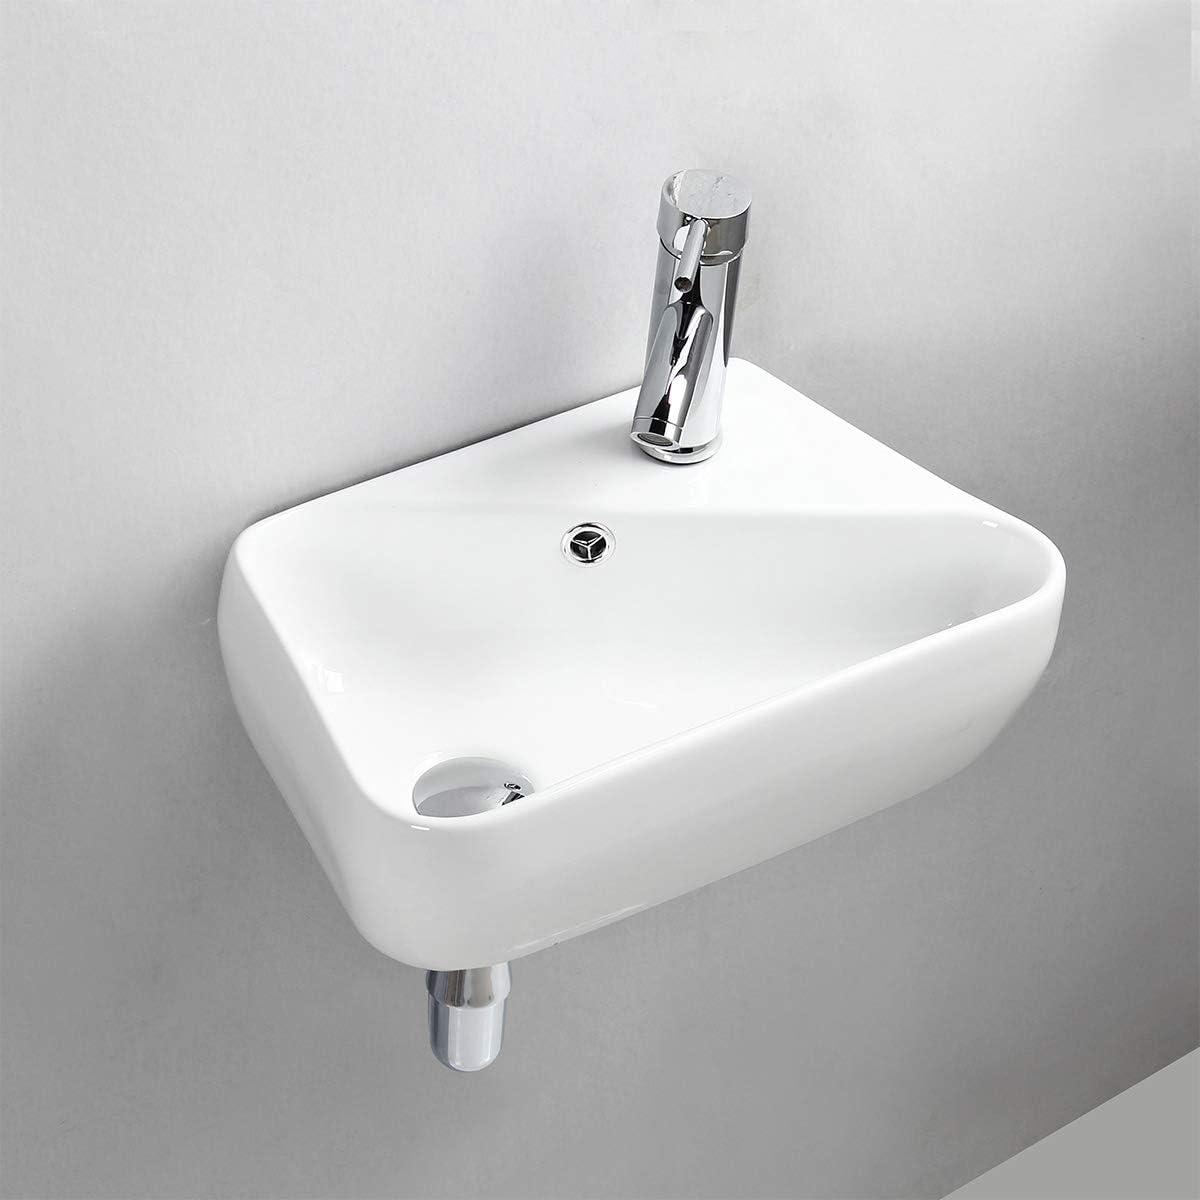 Gimify Lavabo Pequeño de Pared Compacto Mini Lavamanos Cerámico Blanco 45x27.5x15cm